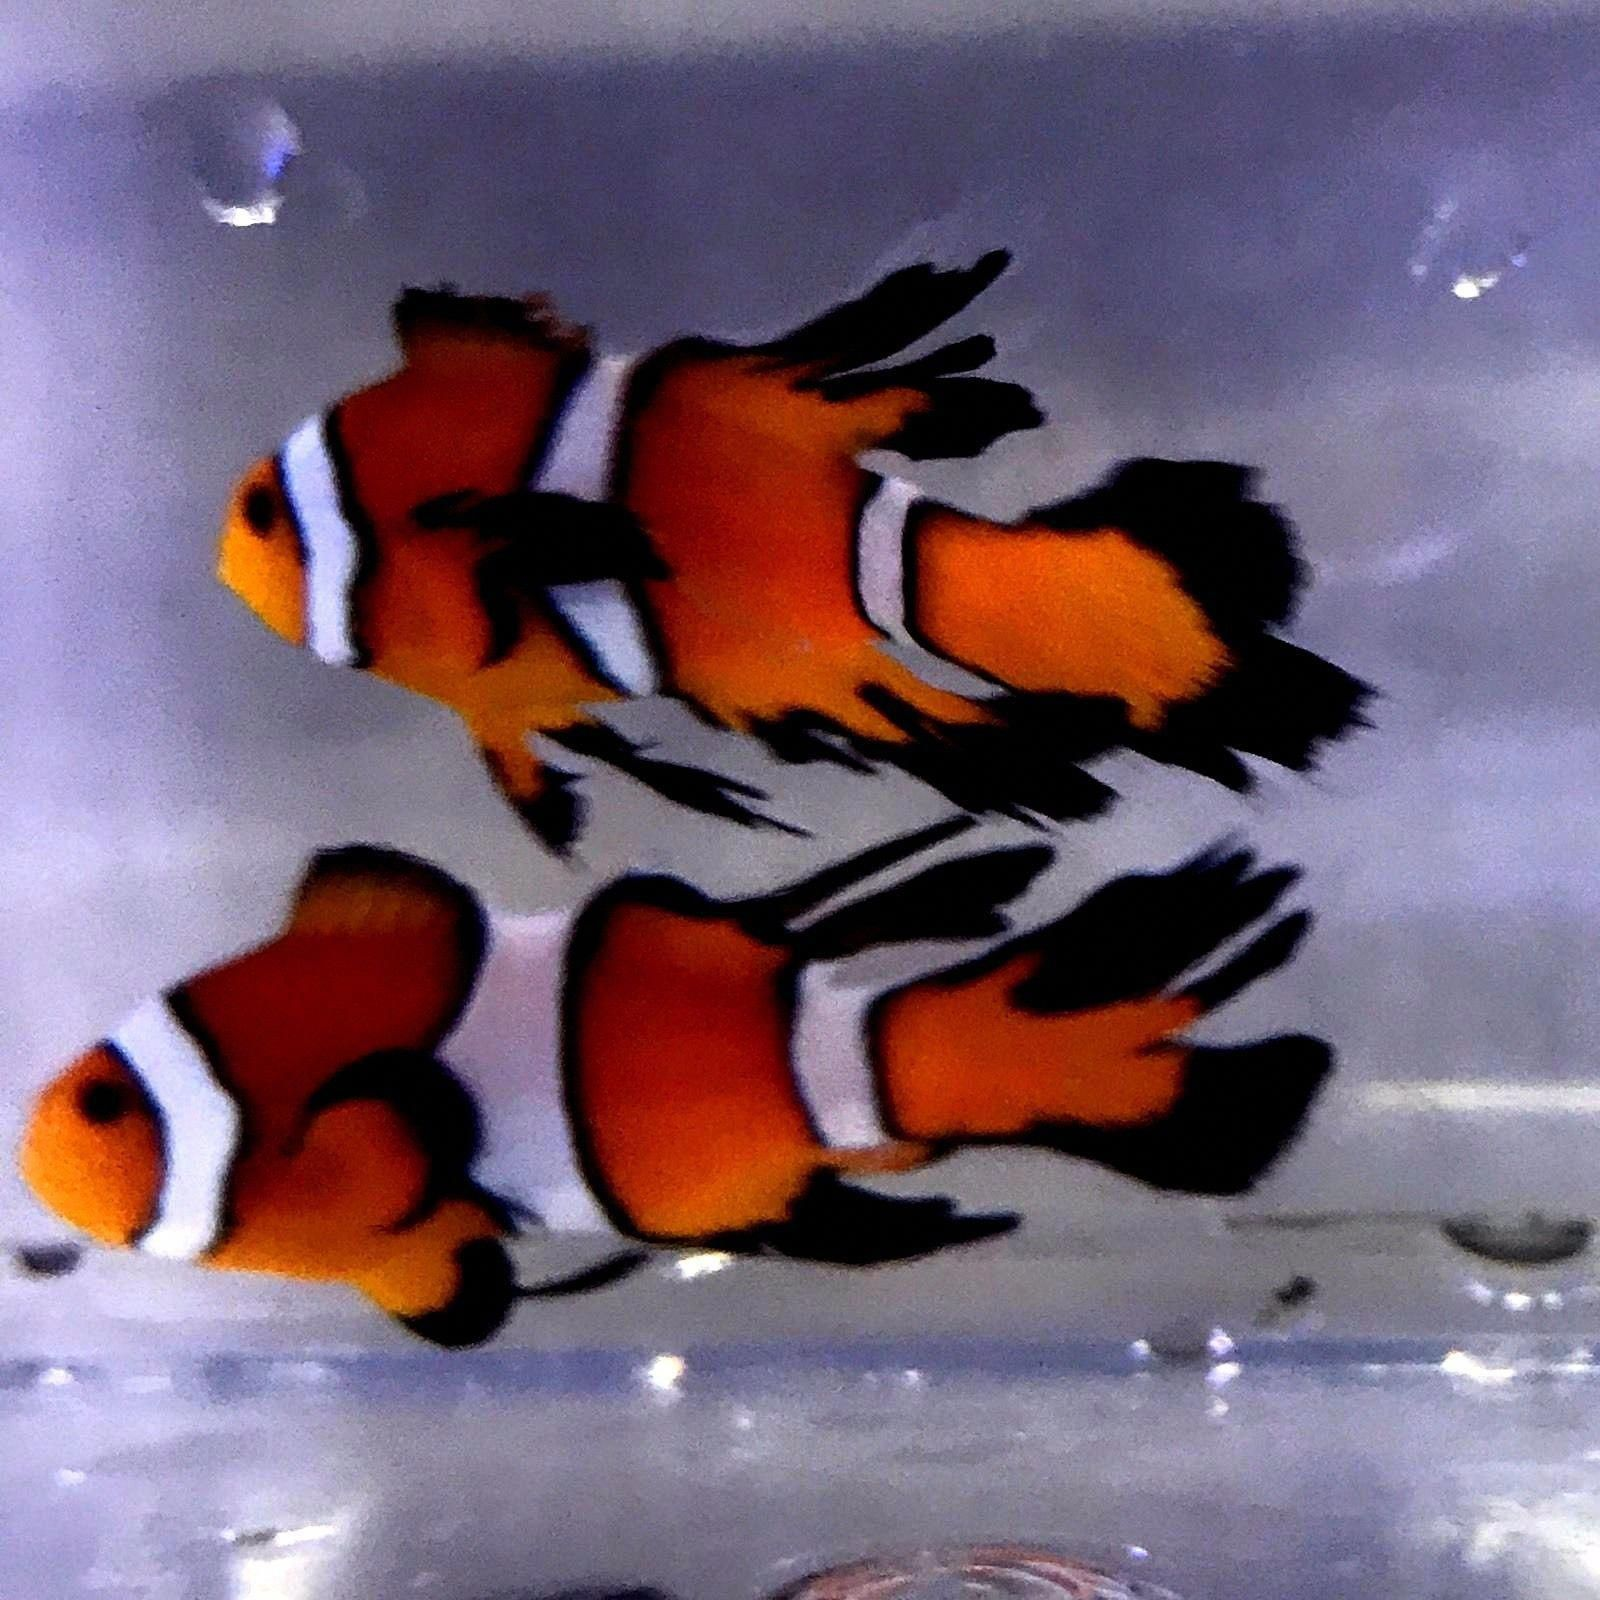 Long Fin Clownfish Pair Wysiwyg Live Marine Fish Saltwater Fish Designer Clowns Clown Fish Animal Room Marine Fish